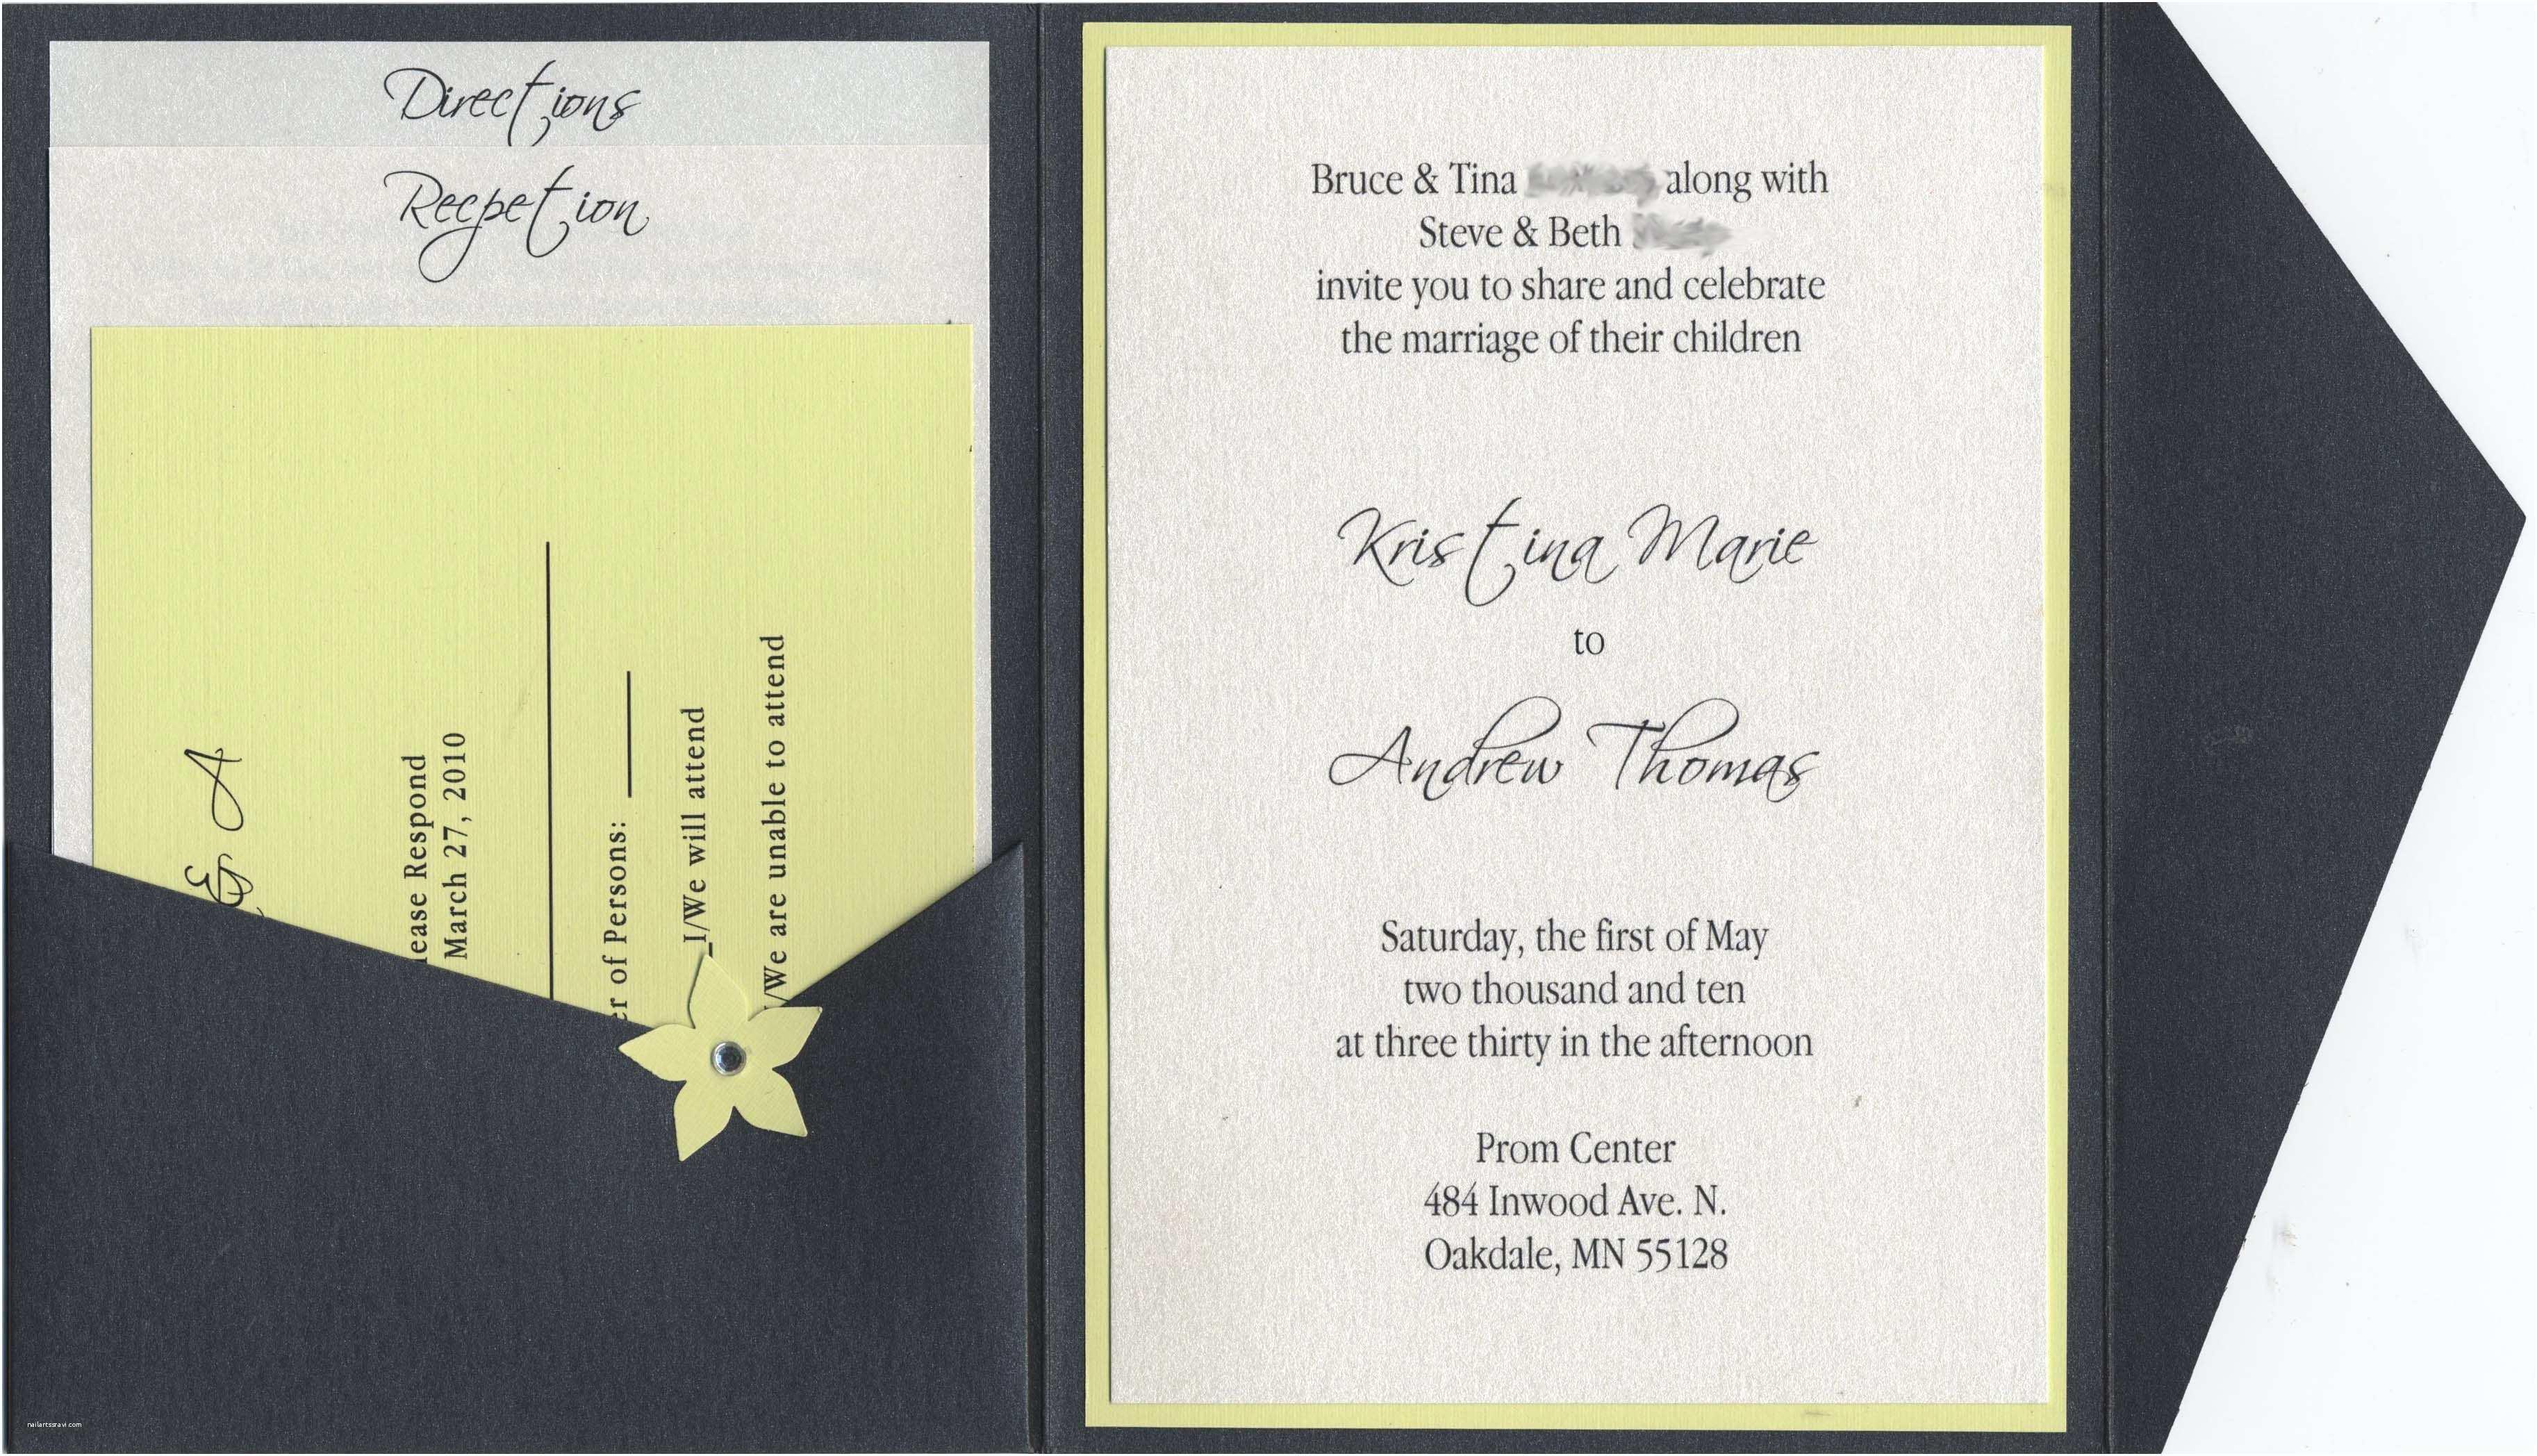 How to Create Wedding Invitation Cards Ideas with How to Make Wedding Invitations at Home